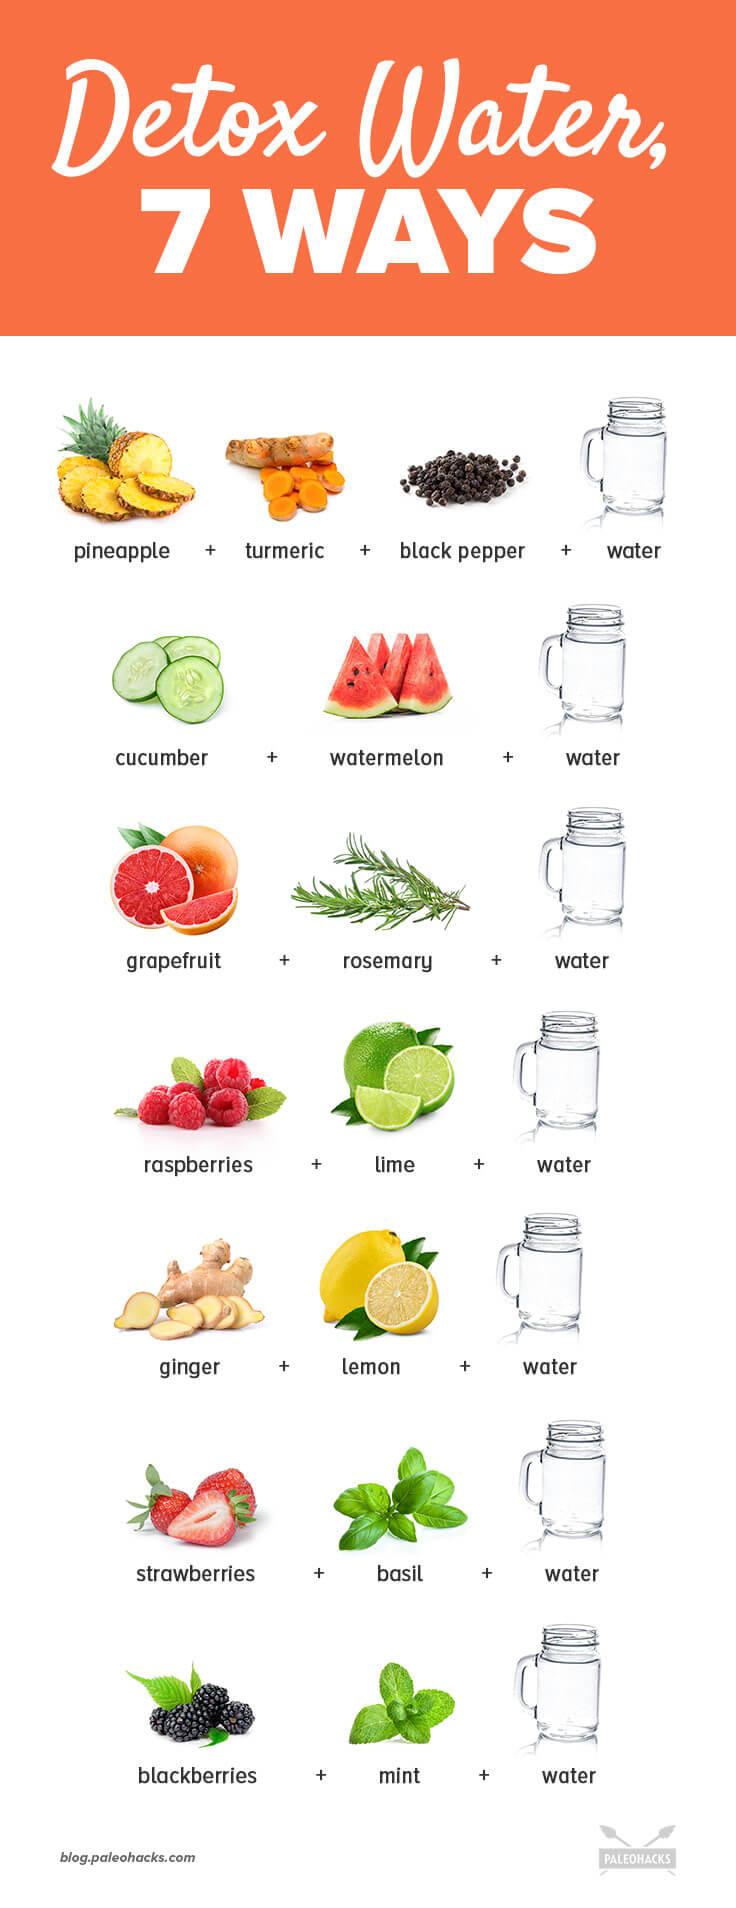 7 Delicious Ways to Drink Detox Water | PaleoHacks